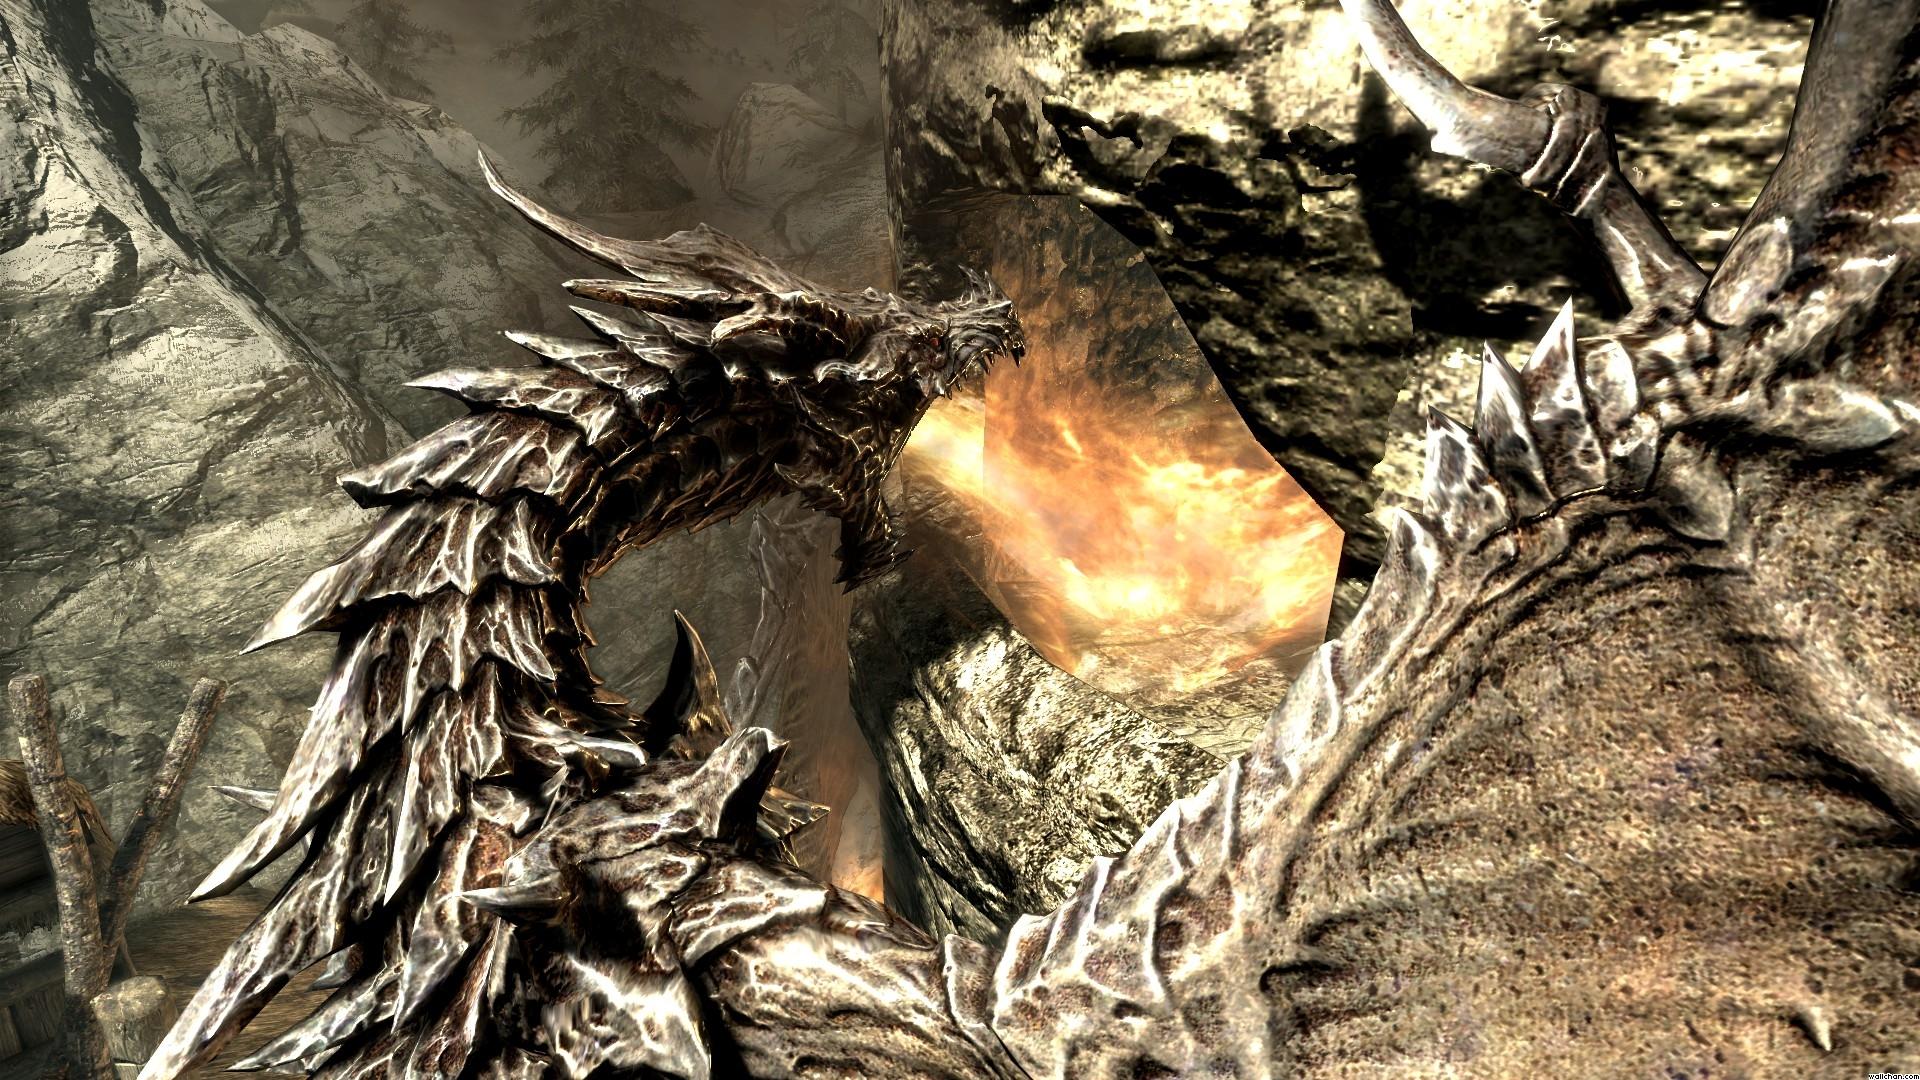 Skyrim Elder Scrolls Dragon Fire fantasy wallpaper ...